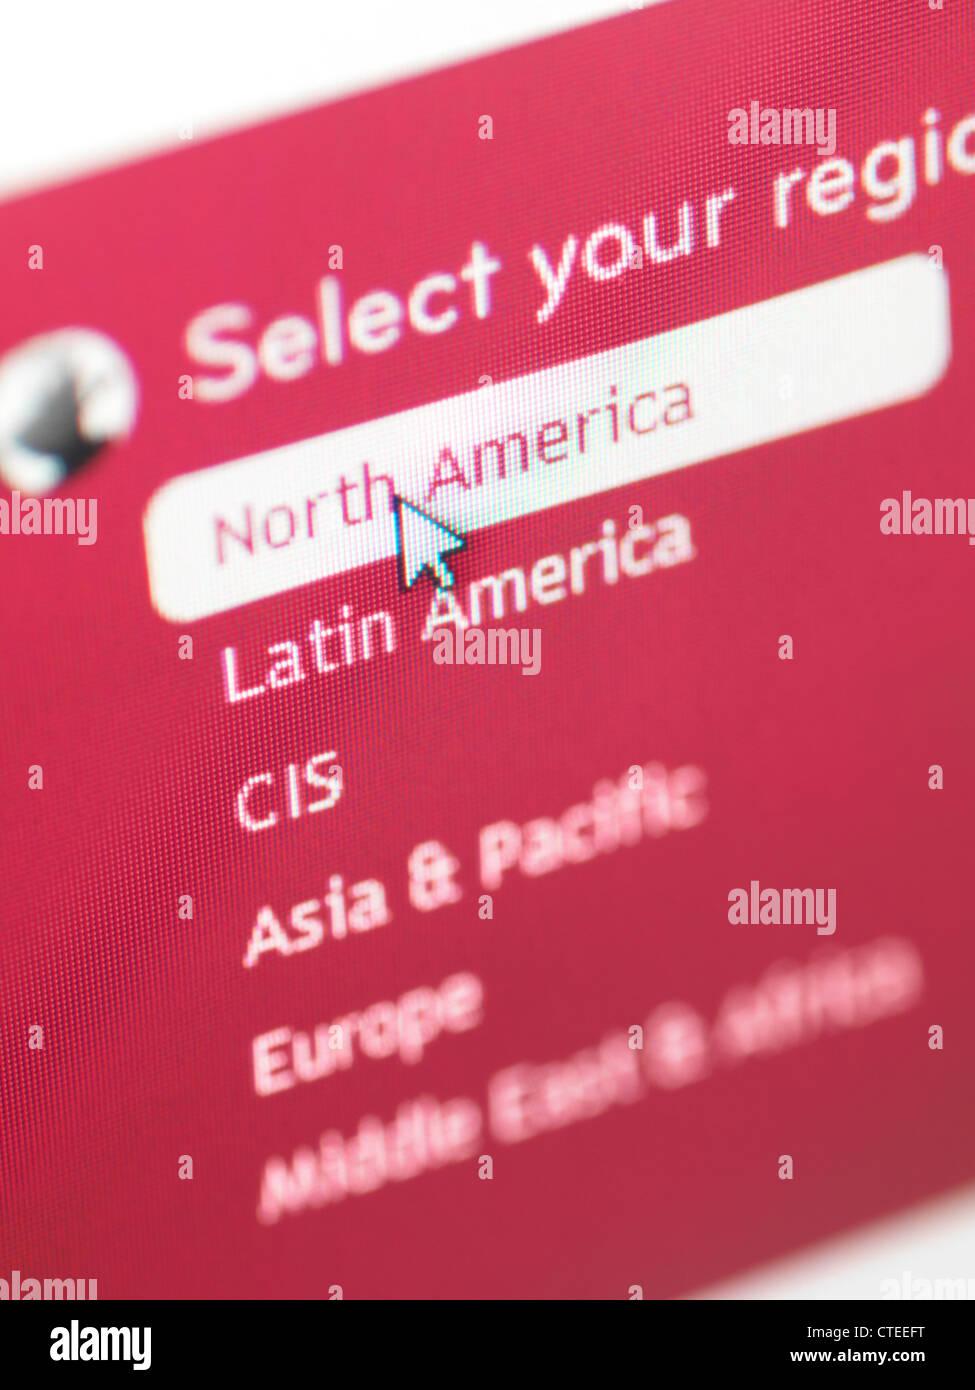 E-commerce web site region selection menu - Stock Image